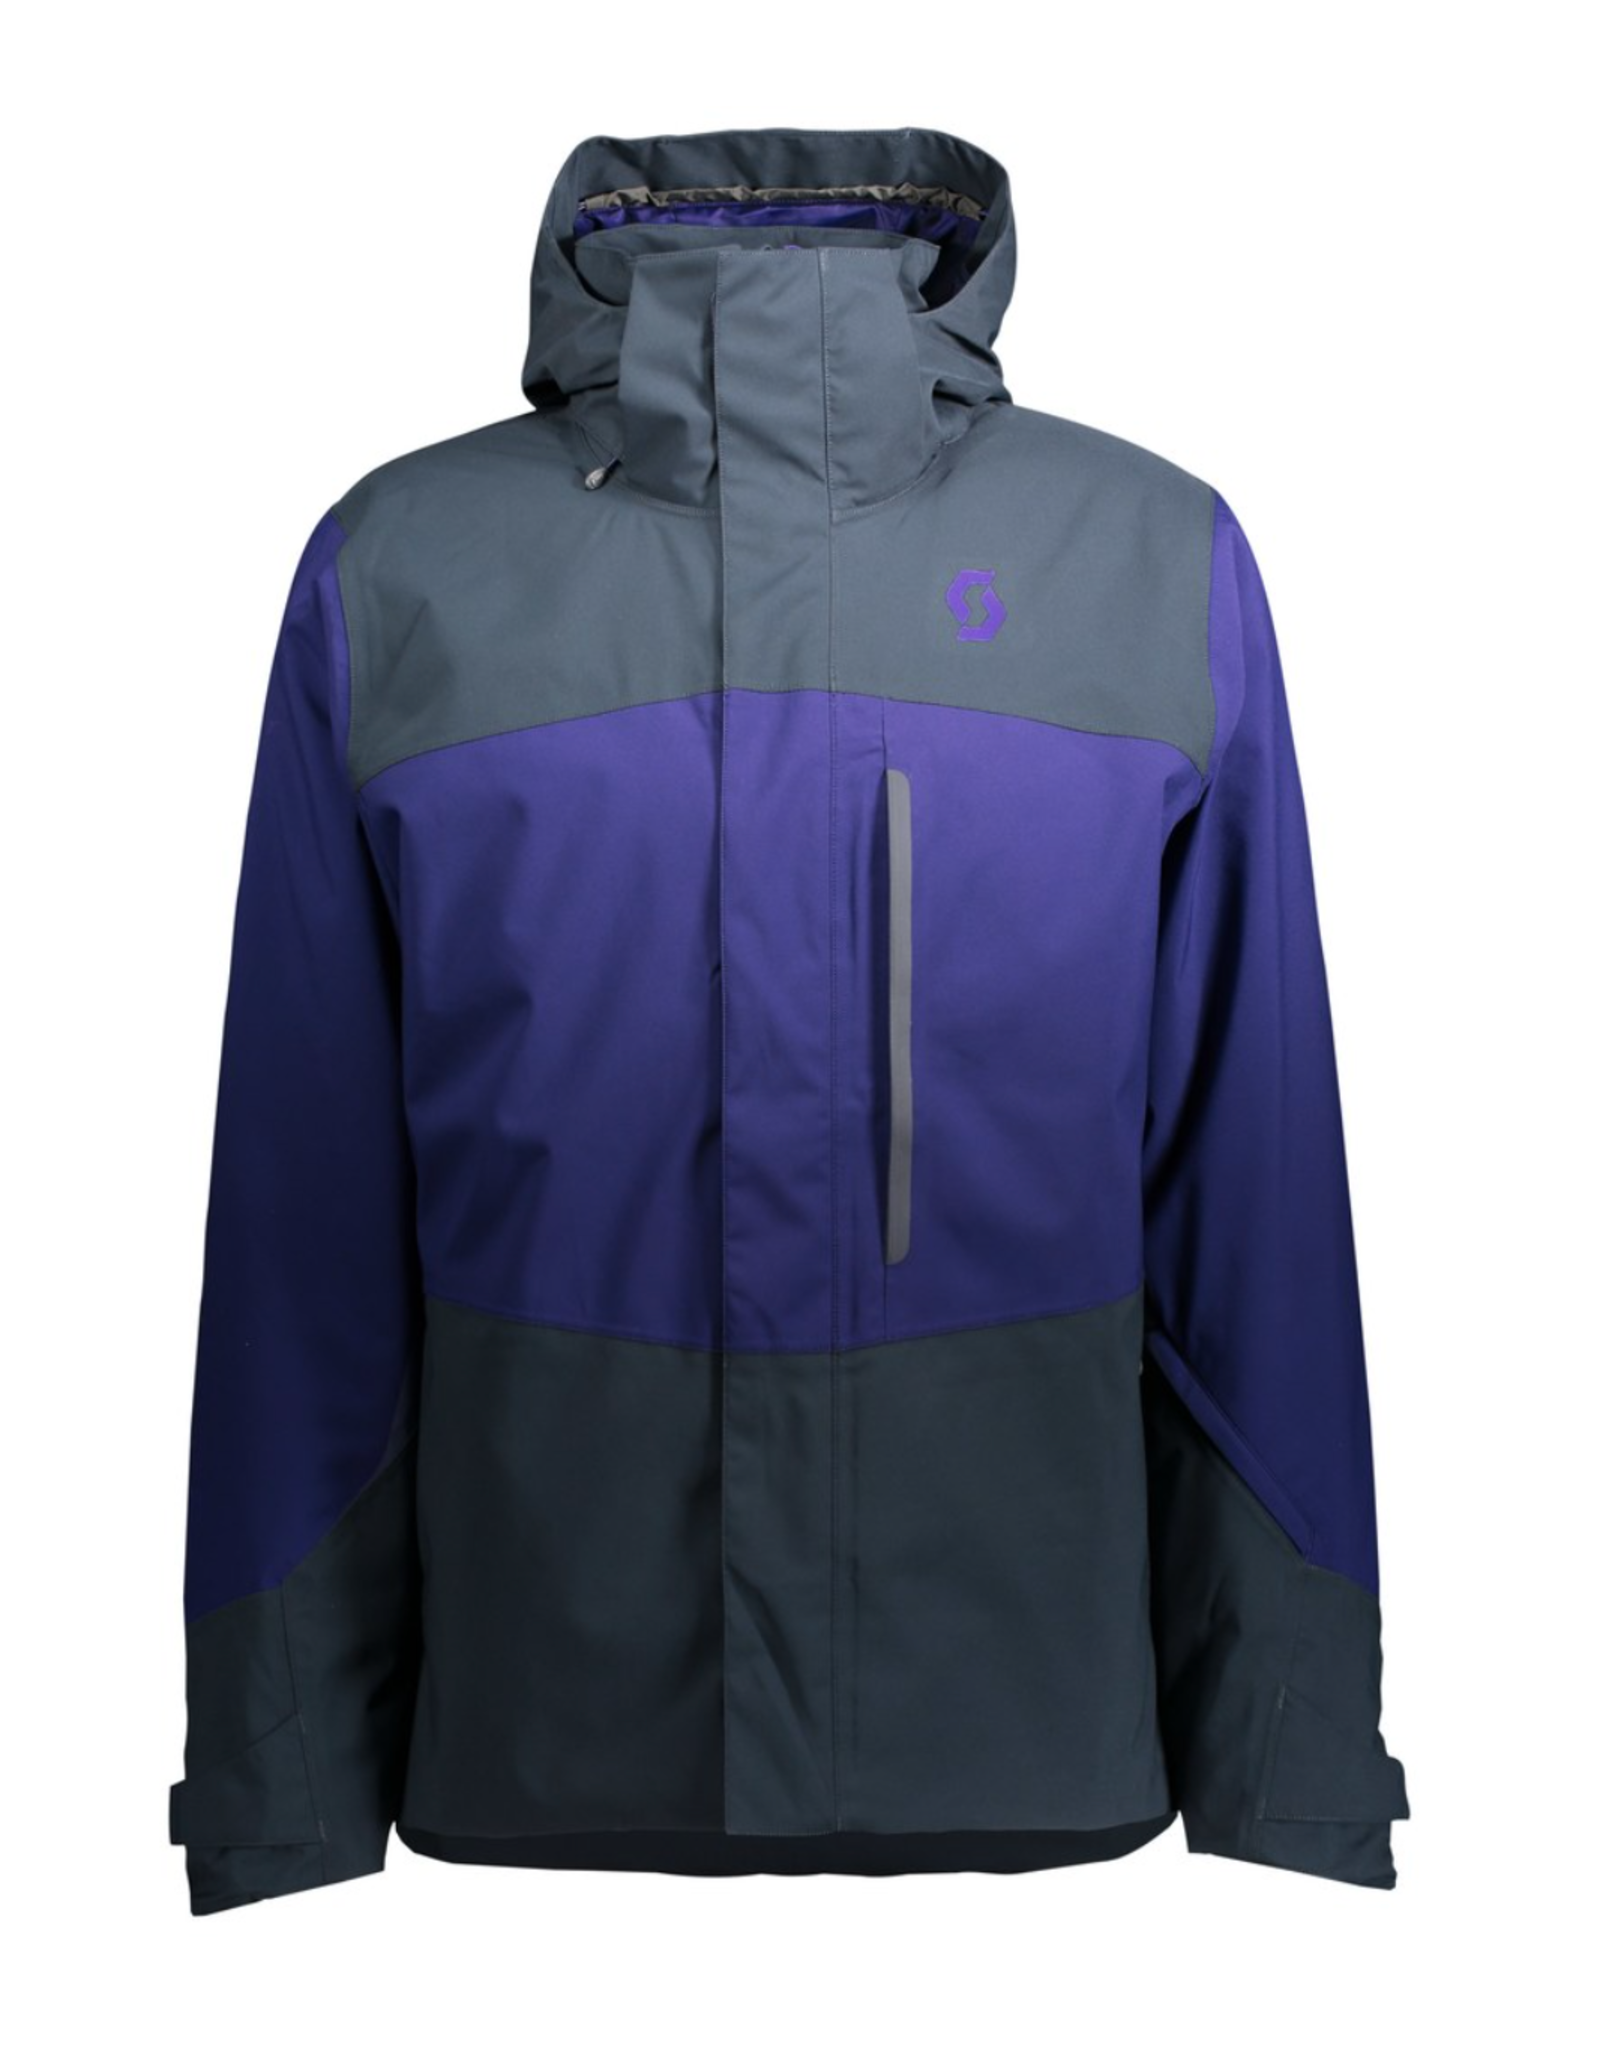 Scott Ultimate Dryo 10 Jacket 2021/22